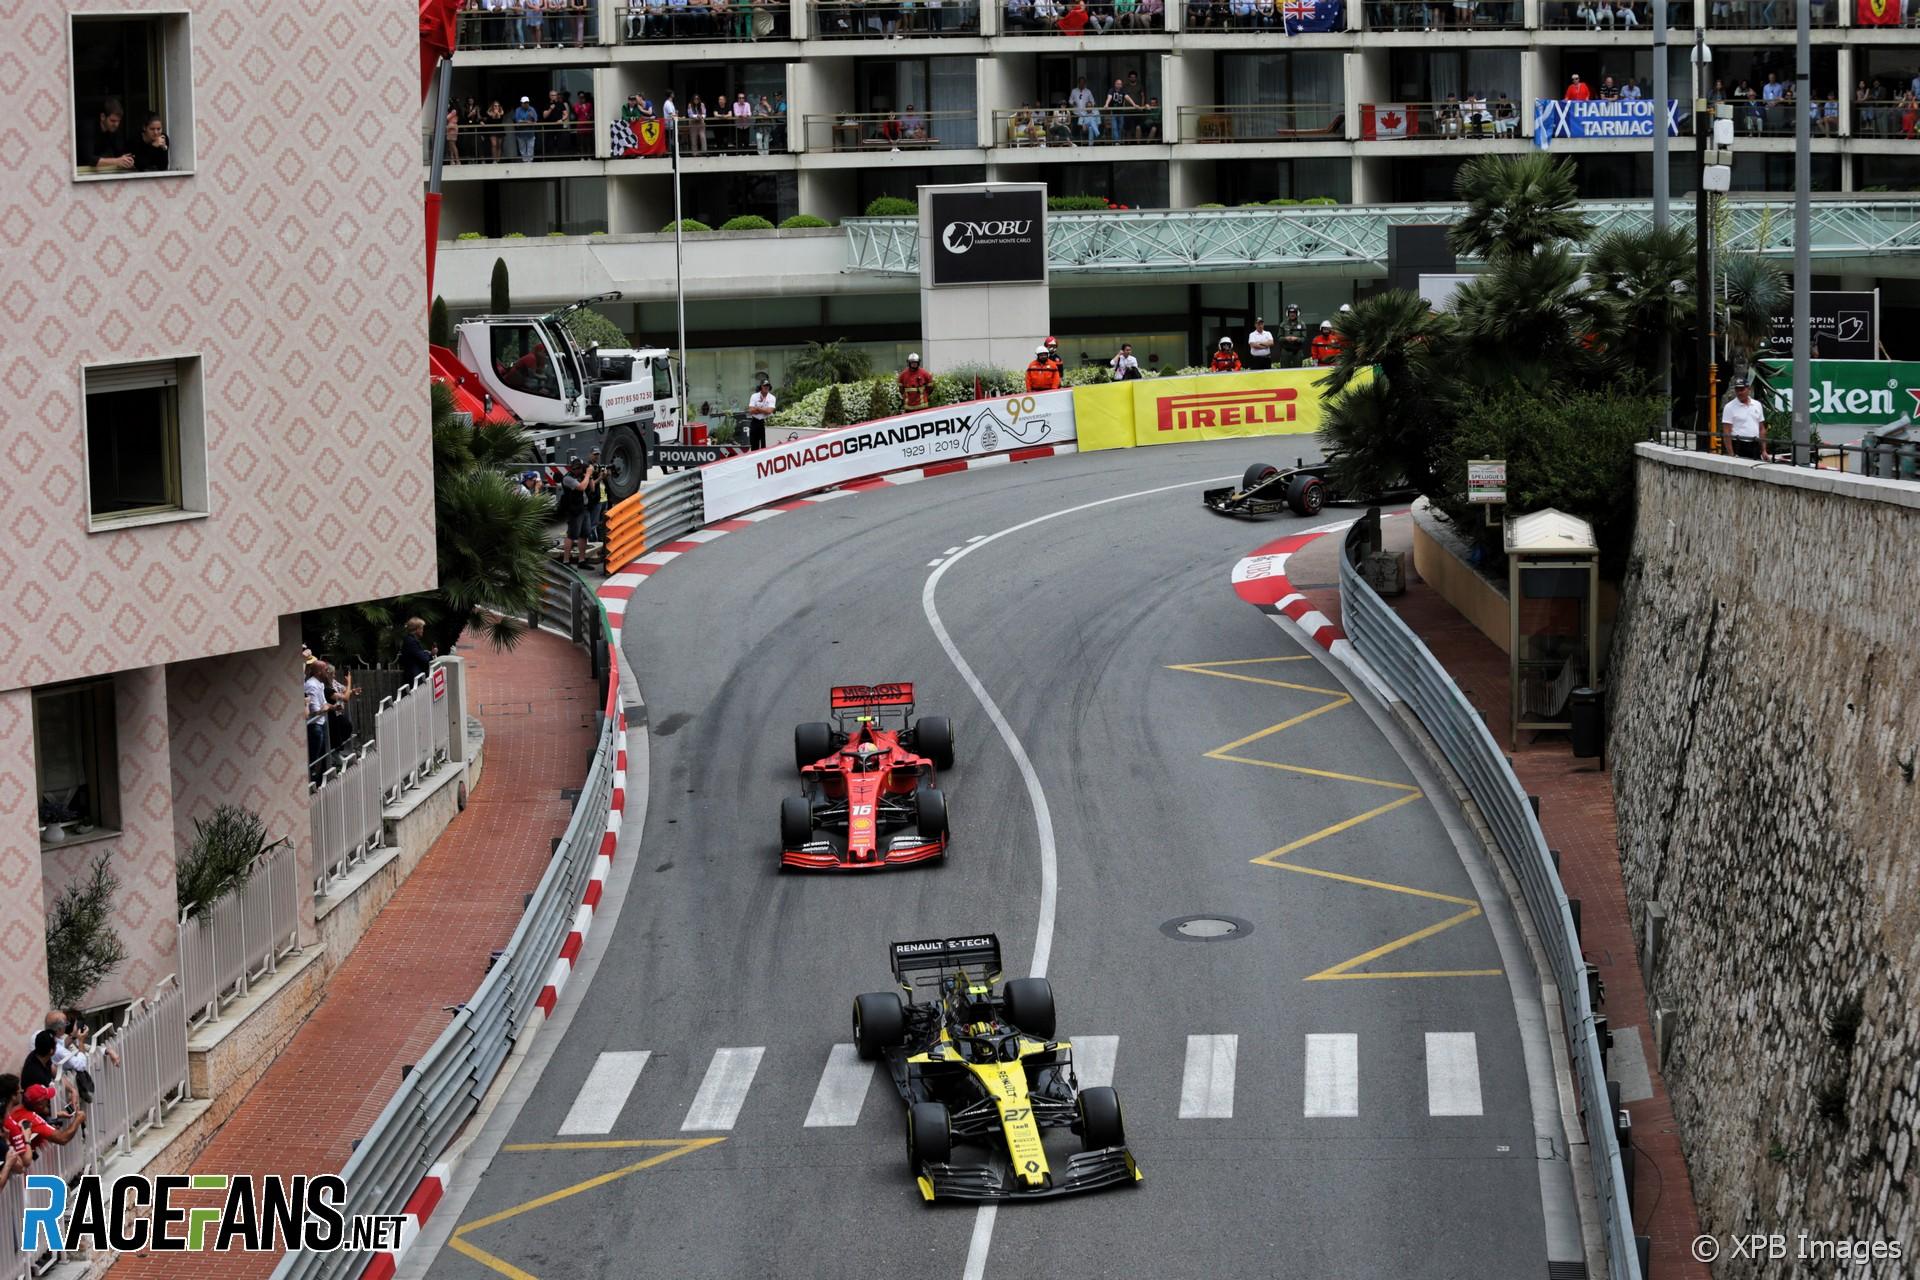 Nico Hulkenberg, Renault, Monaco, 2019